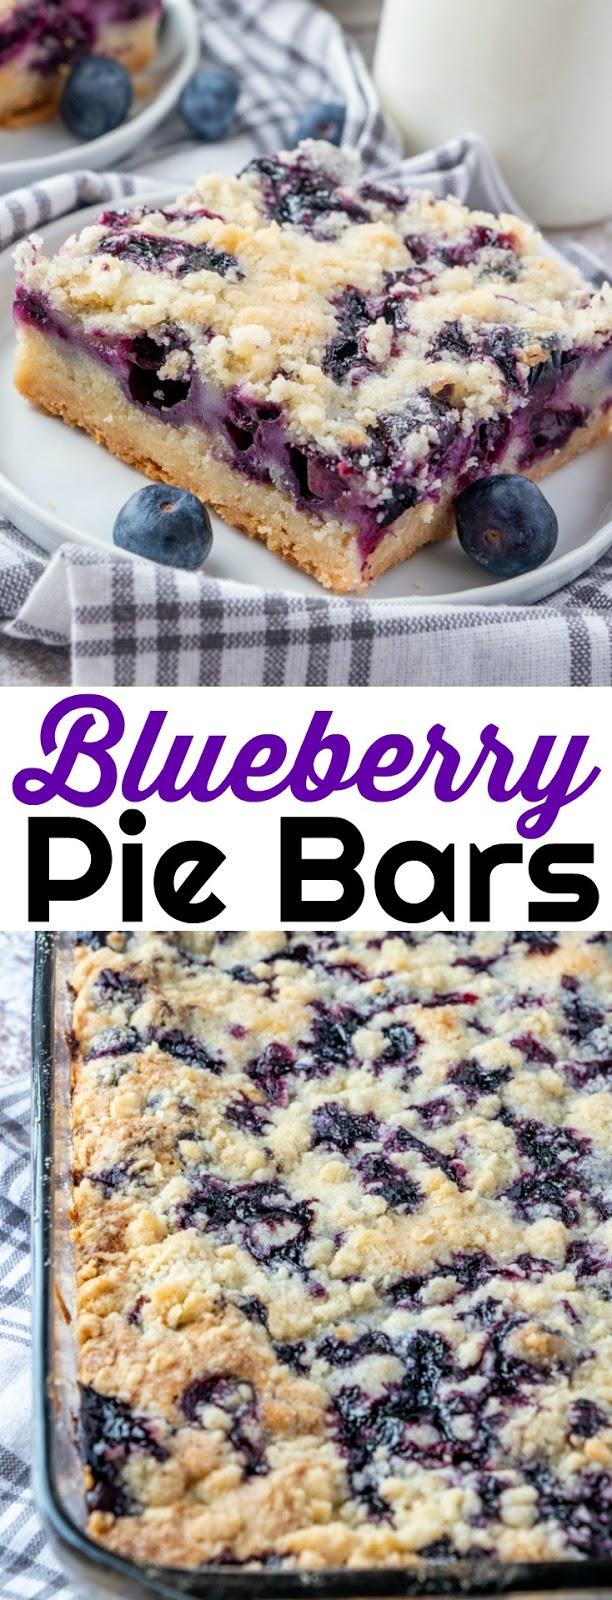 Delicious Blueberry Pie Bars Recipe